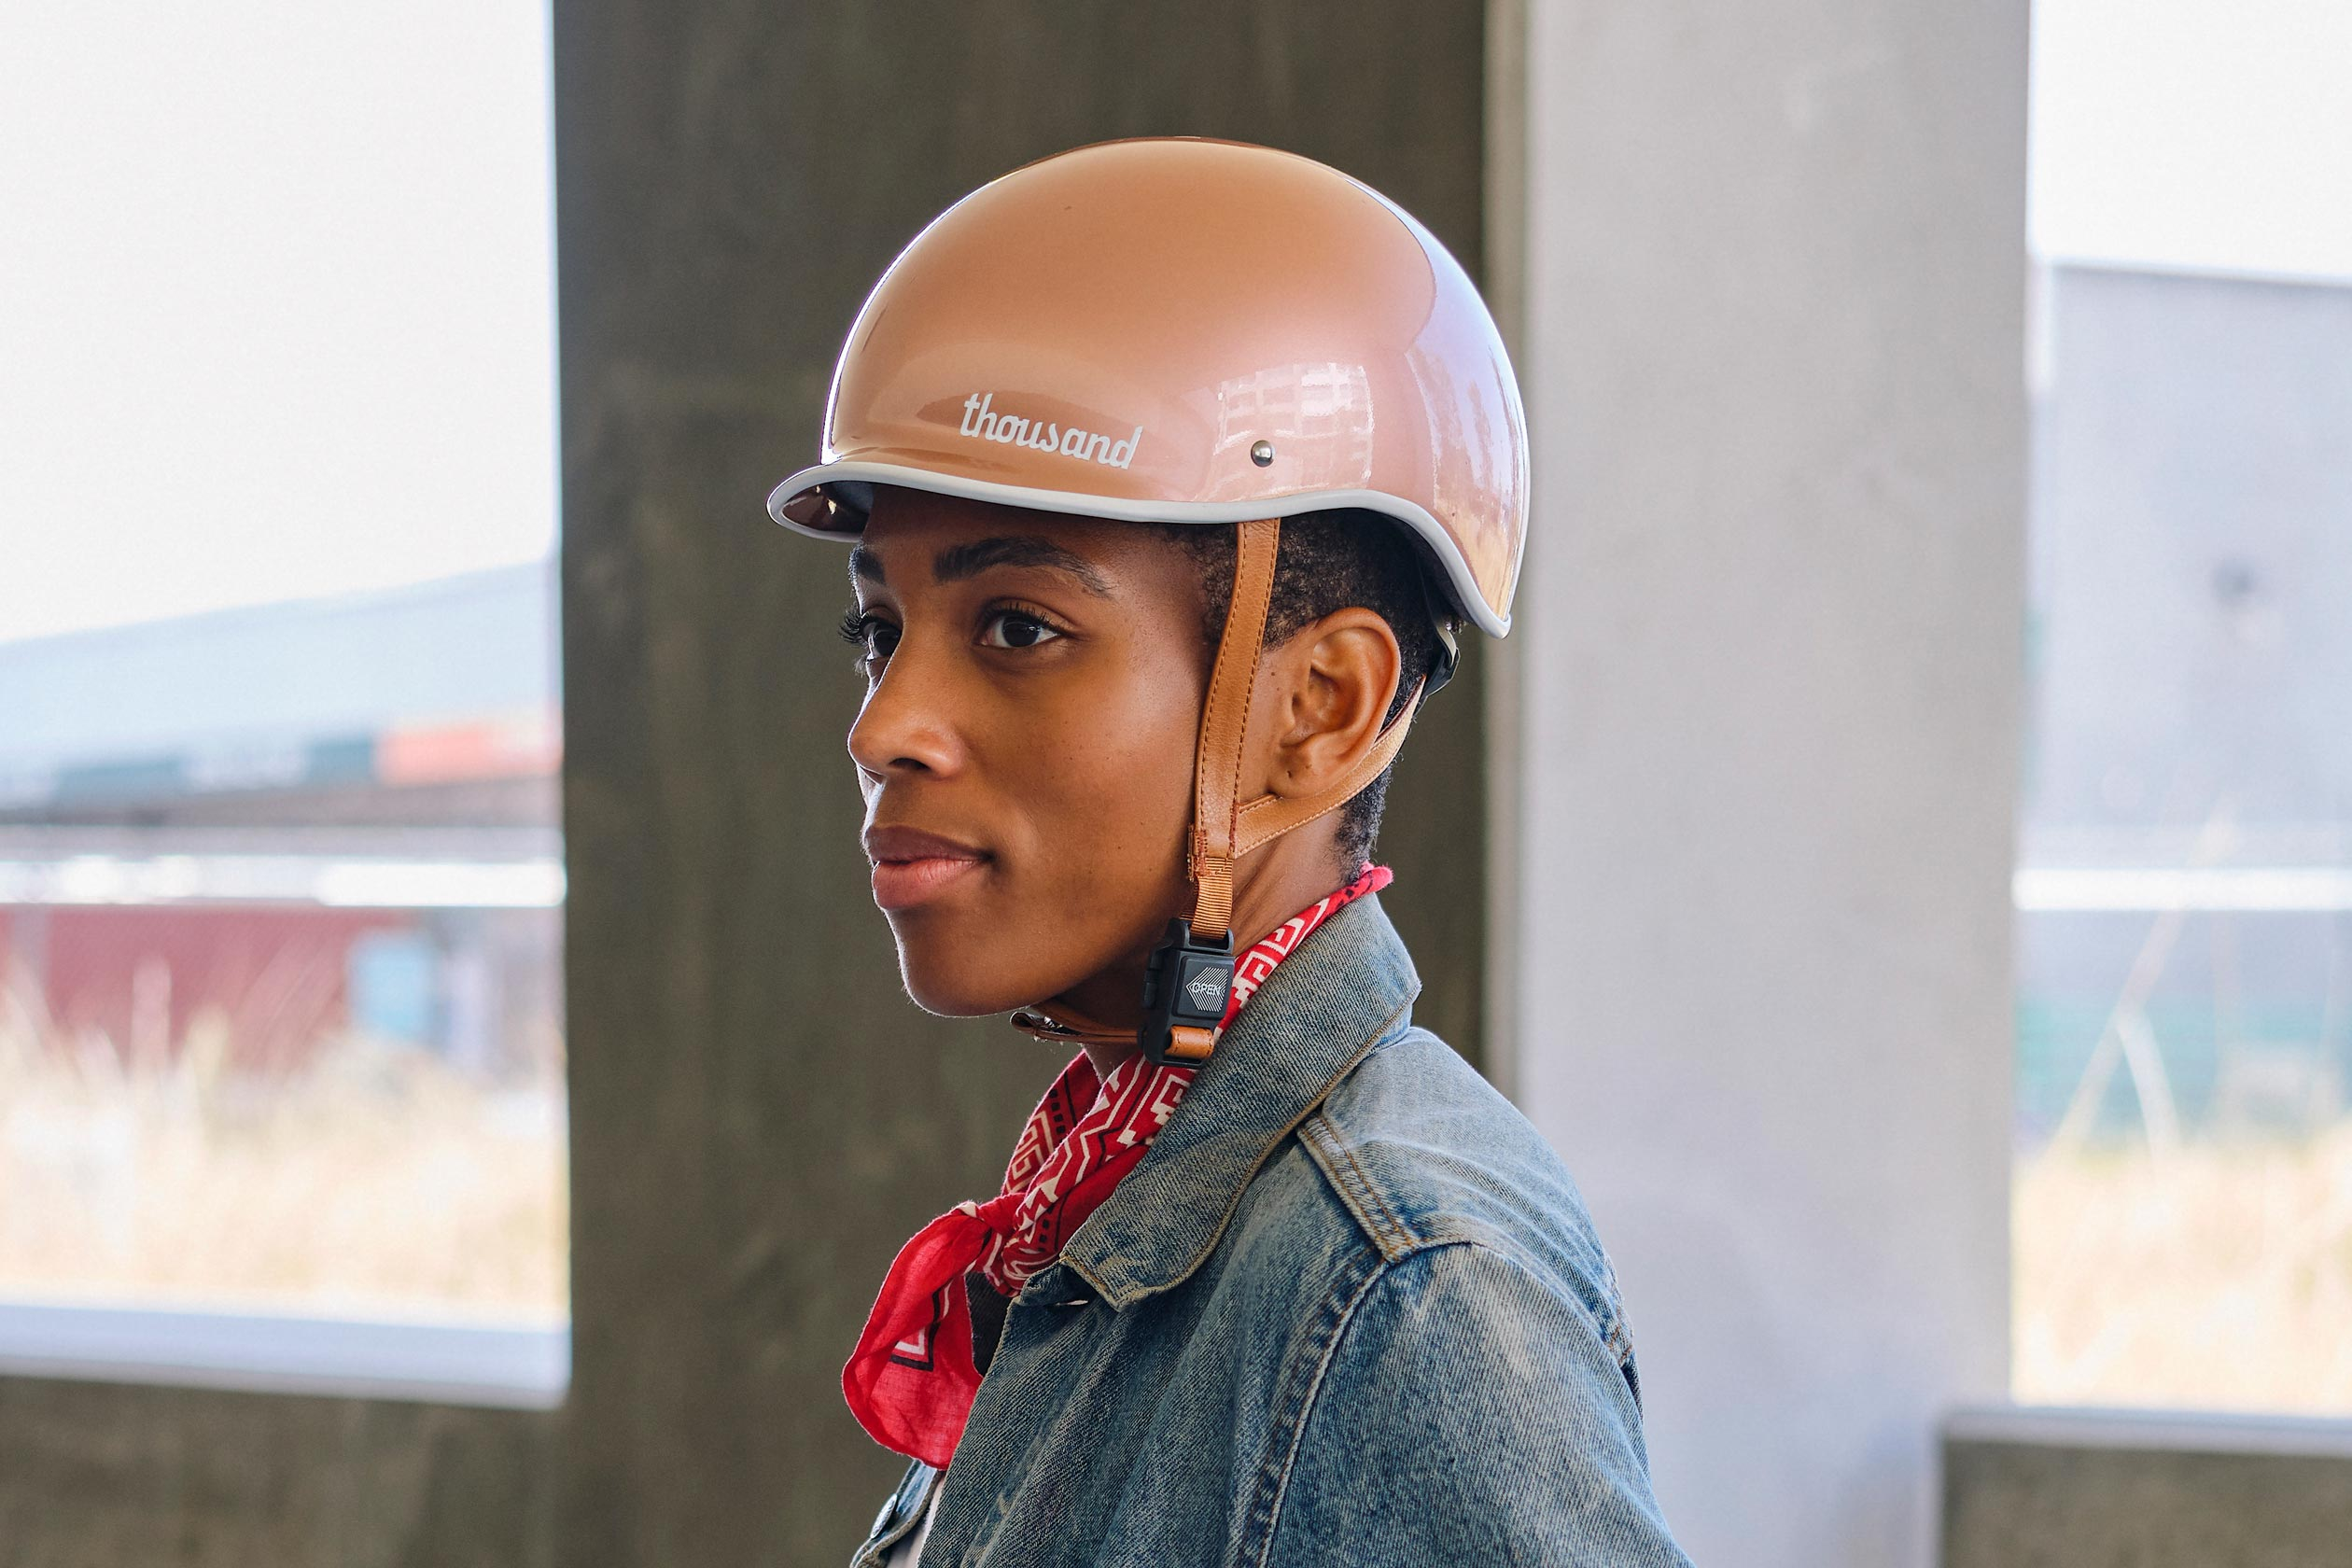 Heritage Bike Helmet, Rose Gold